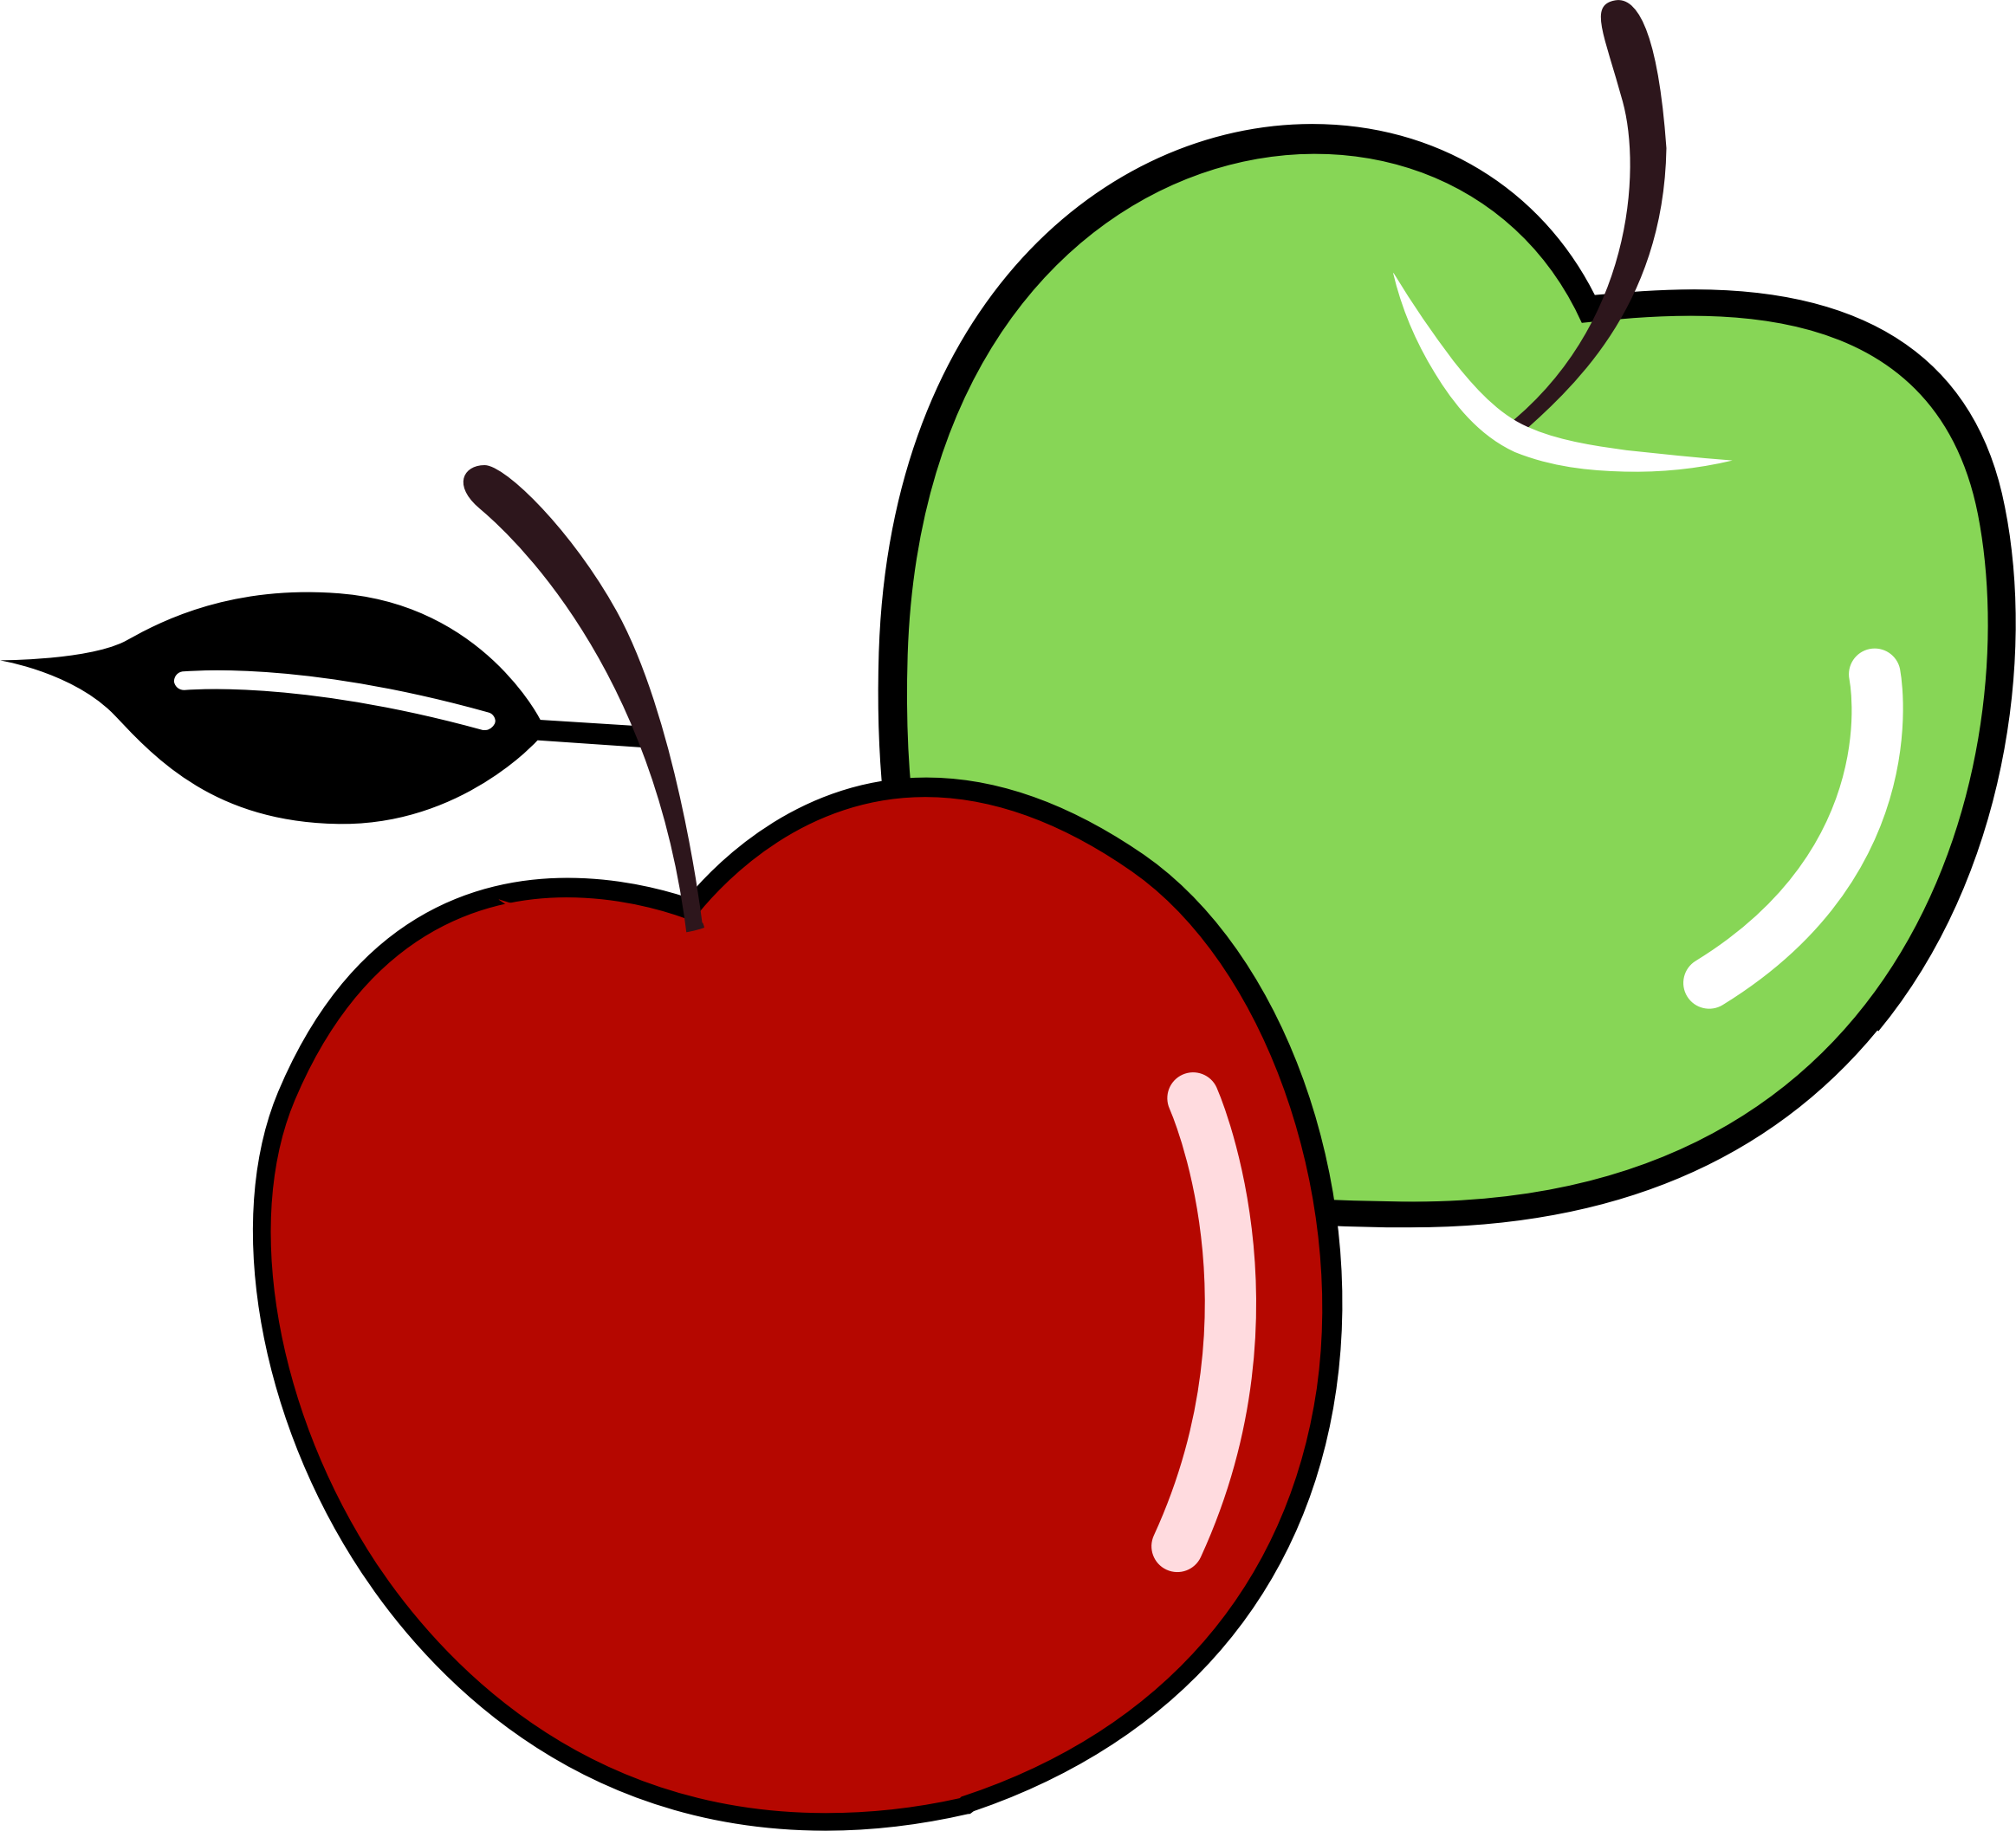 Big image png. Apples clipart pdf